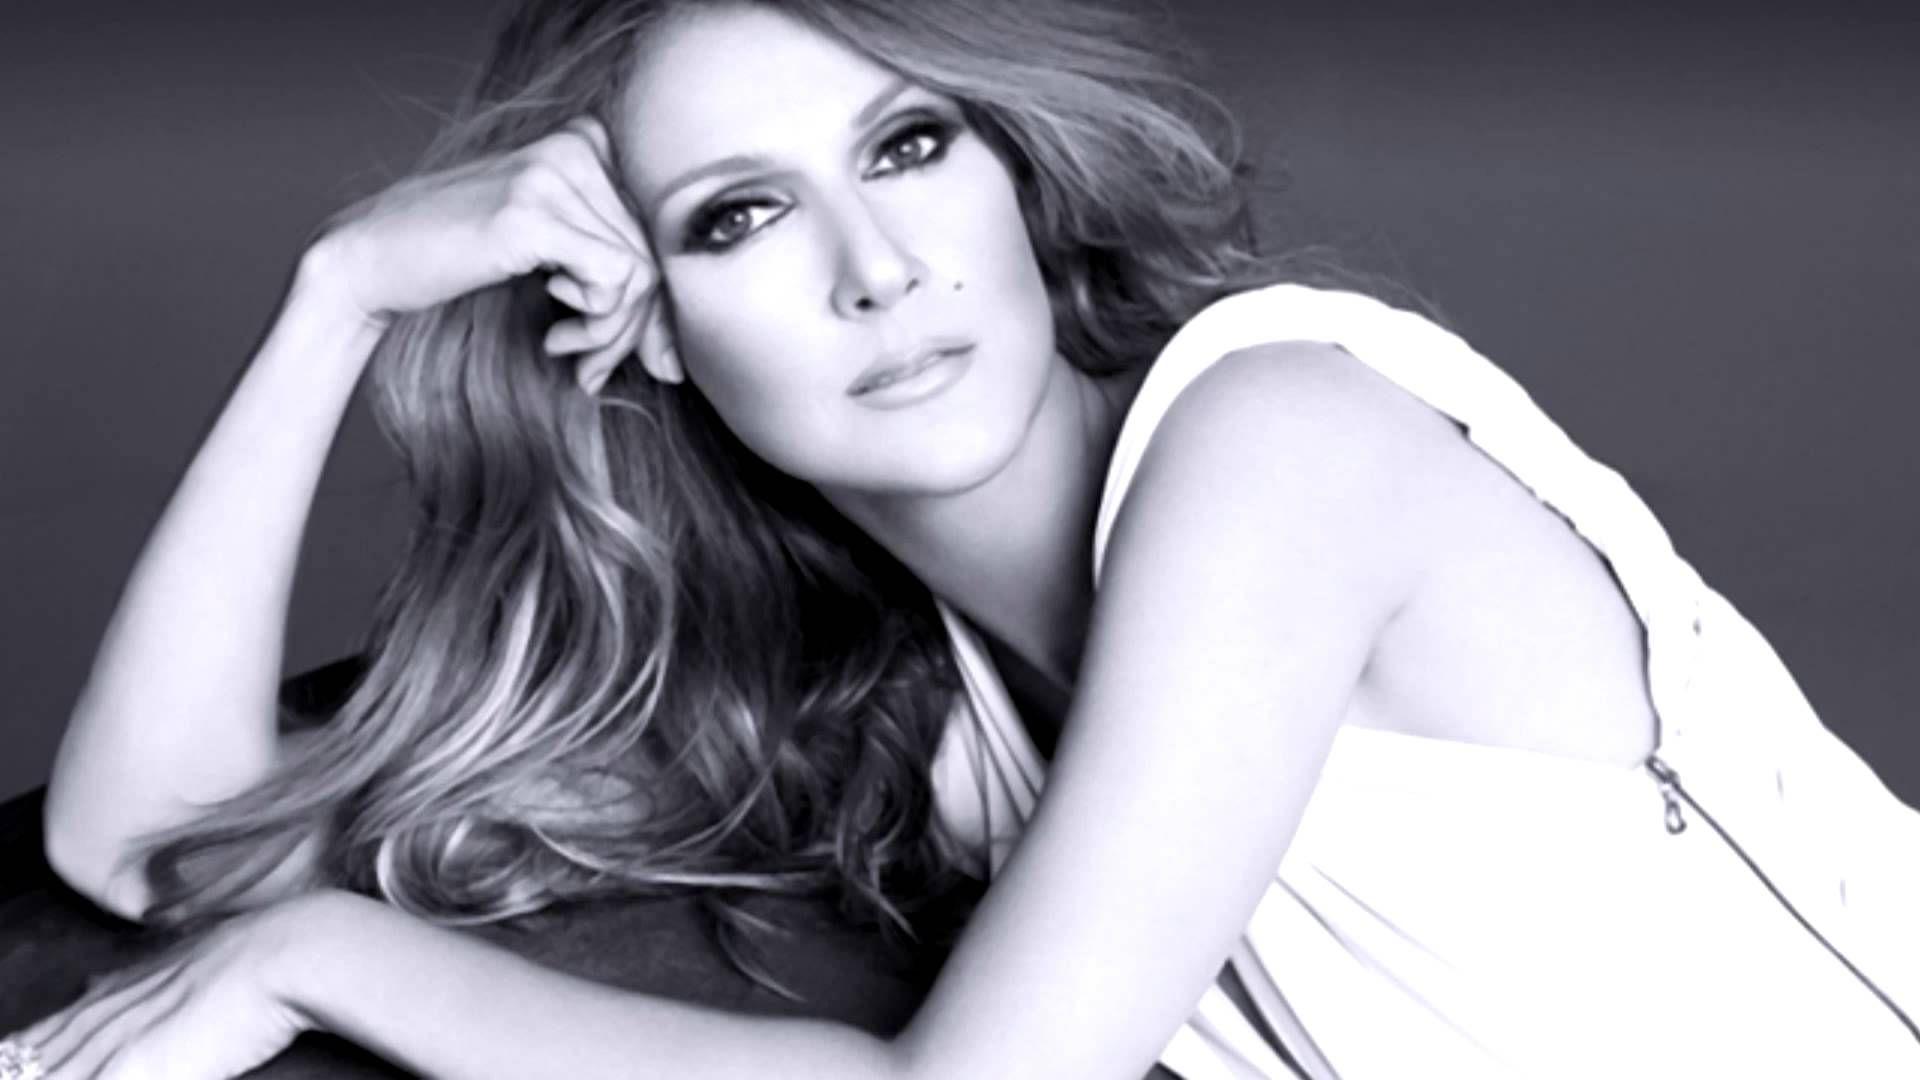 Celine Dion Ne Me Quitte Pas Youtube Celine Dion Celine Dion Tickets Celine